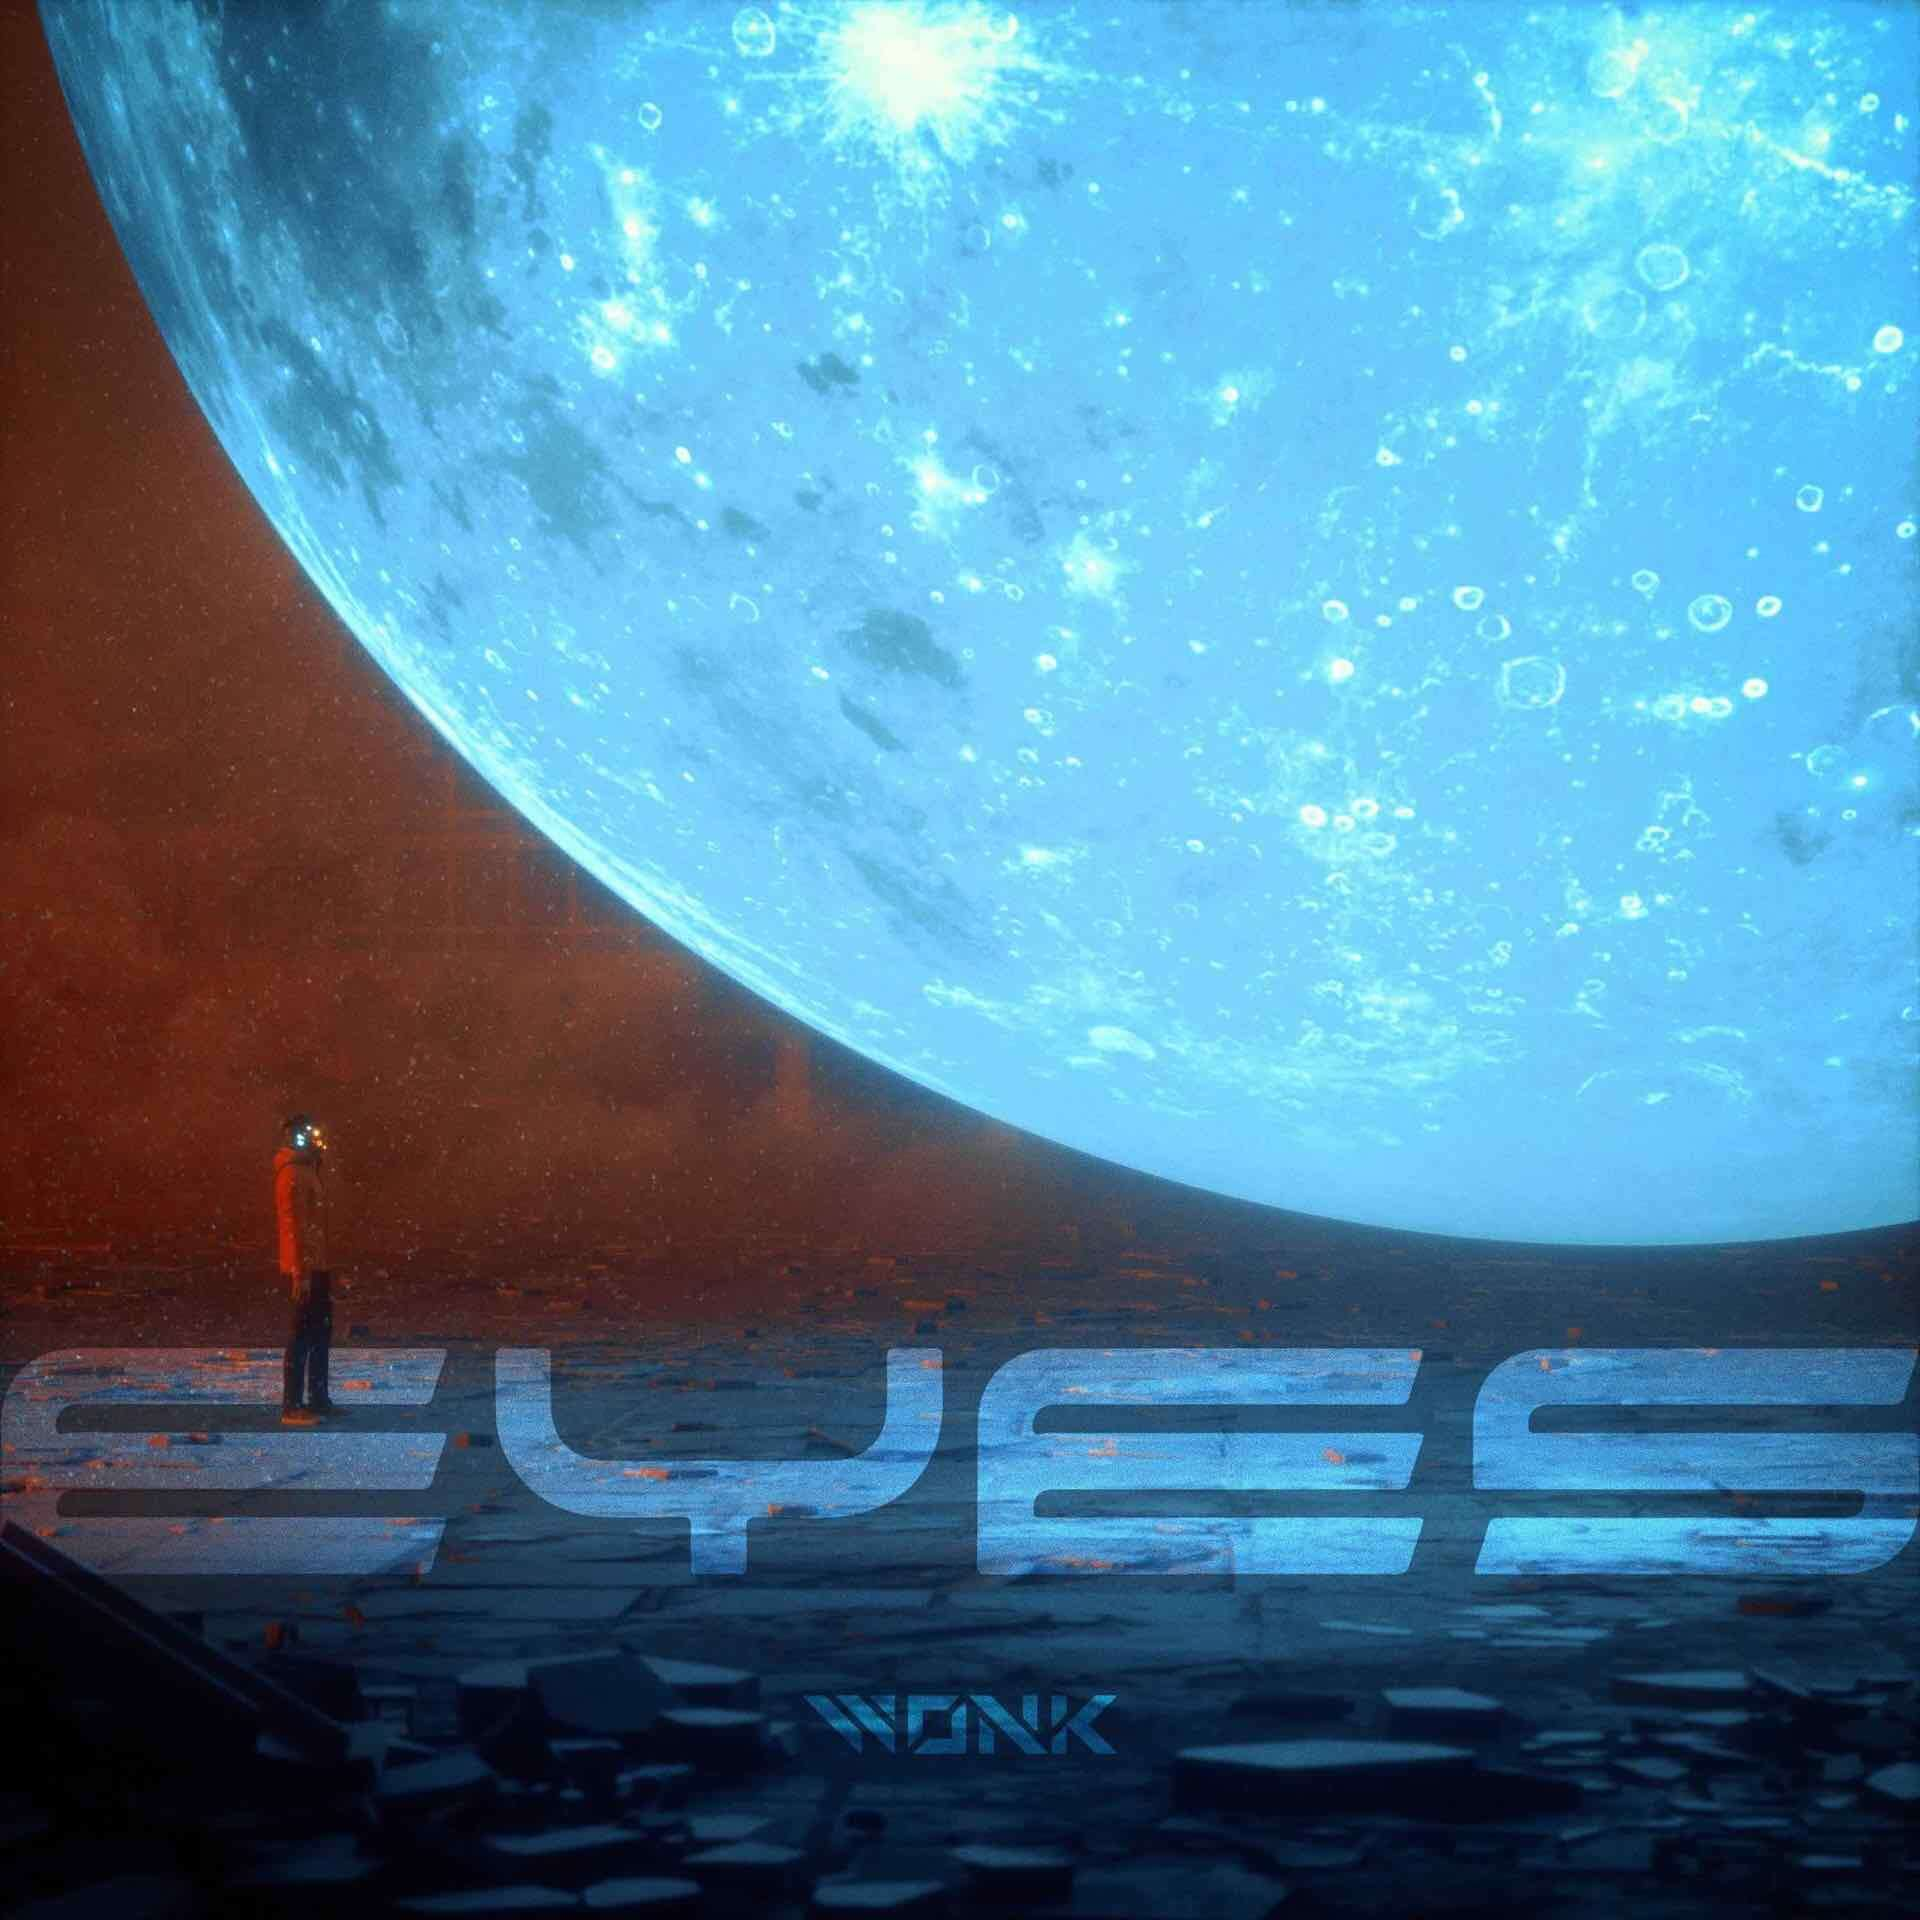 WONK最新作『EYES』の発売記念3DCGライブ<EYES SPECIAL 3DCG LIVE>の詳細が発表!ティーザー映像も公開 music200713_wonk_1-1920x1920